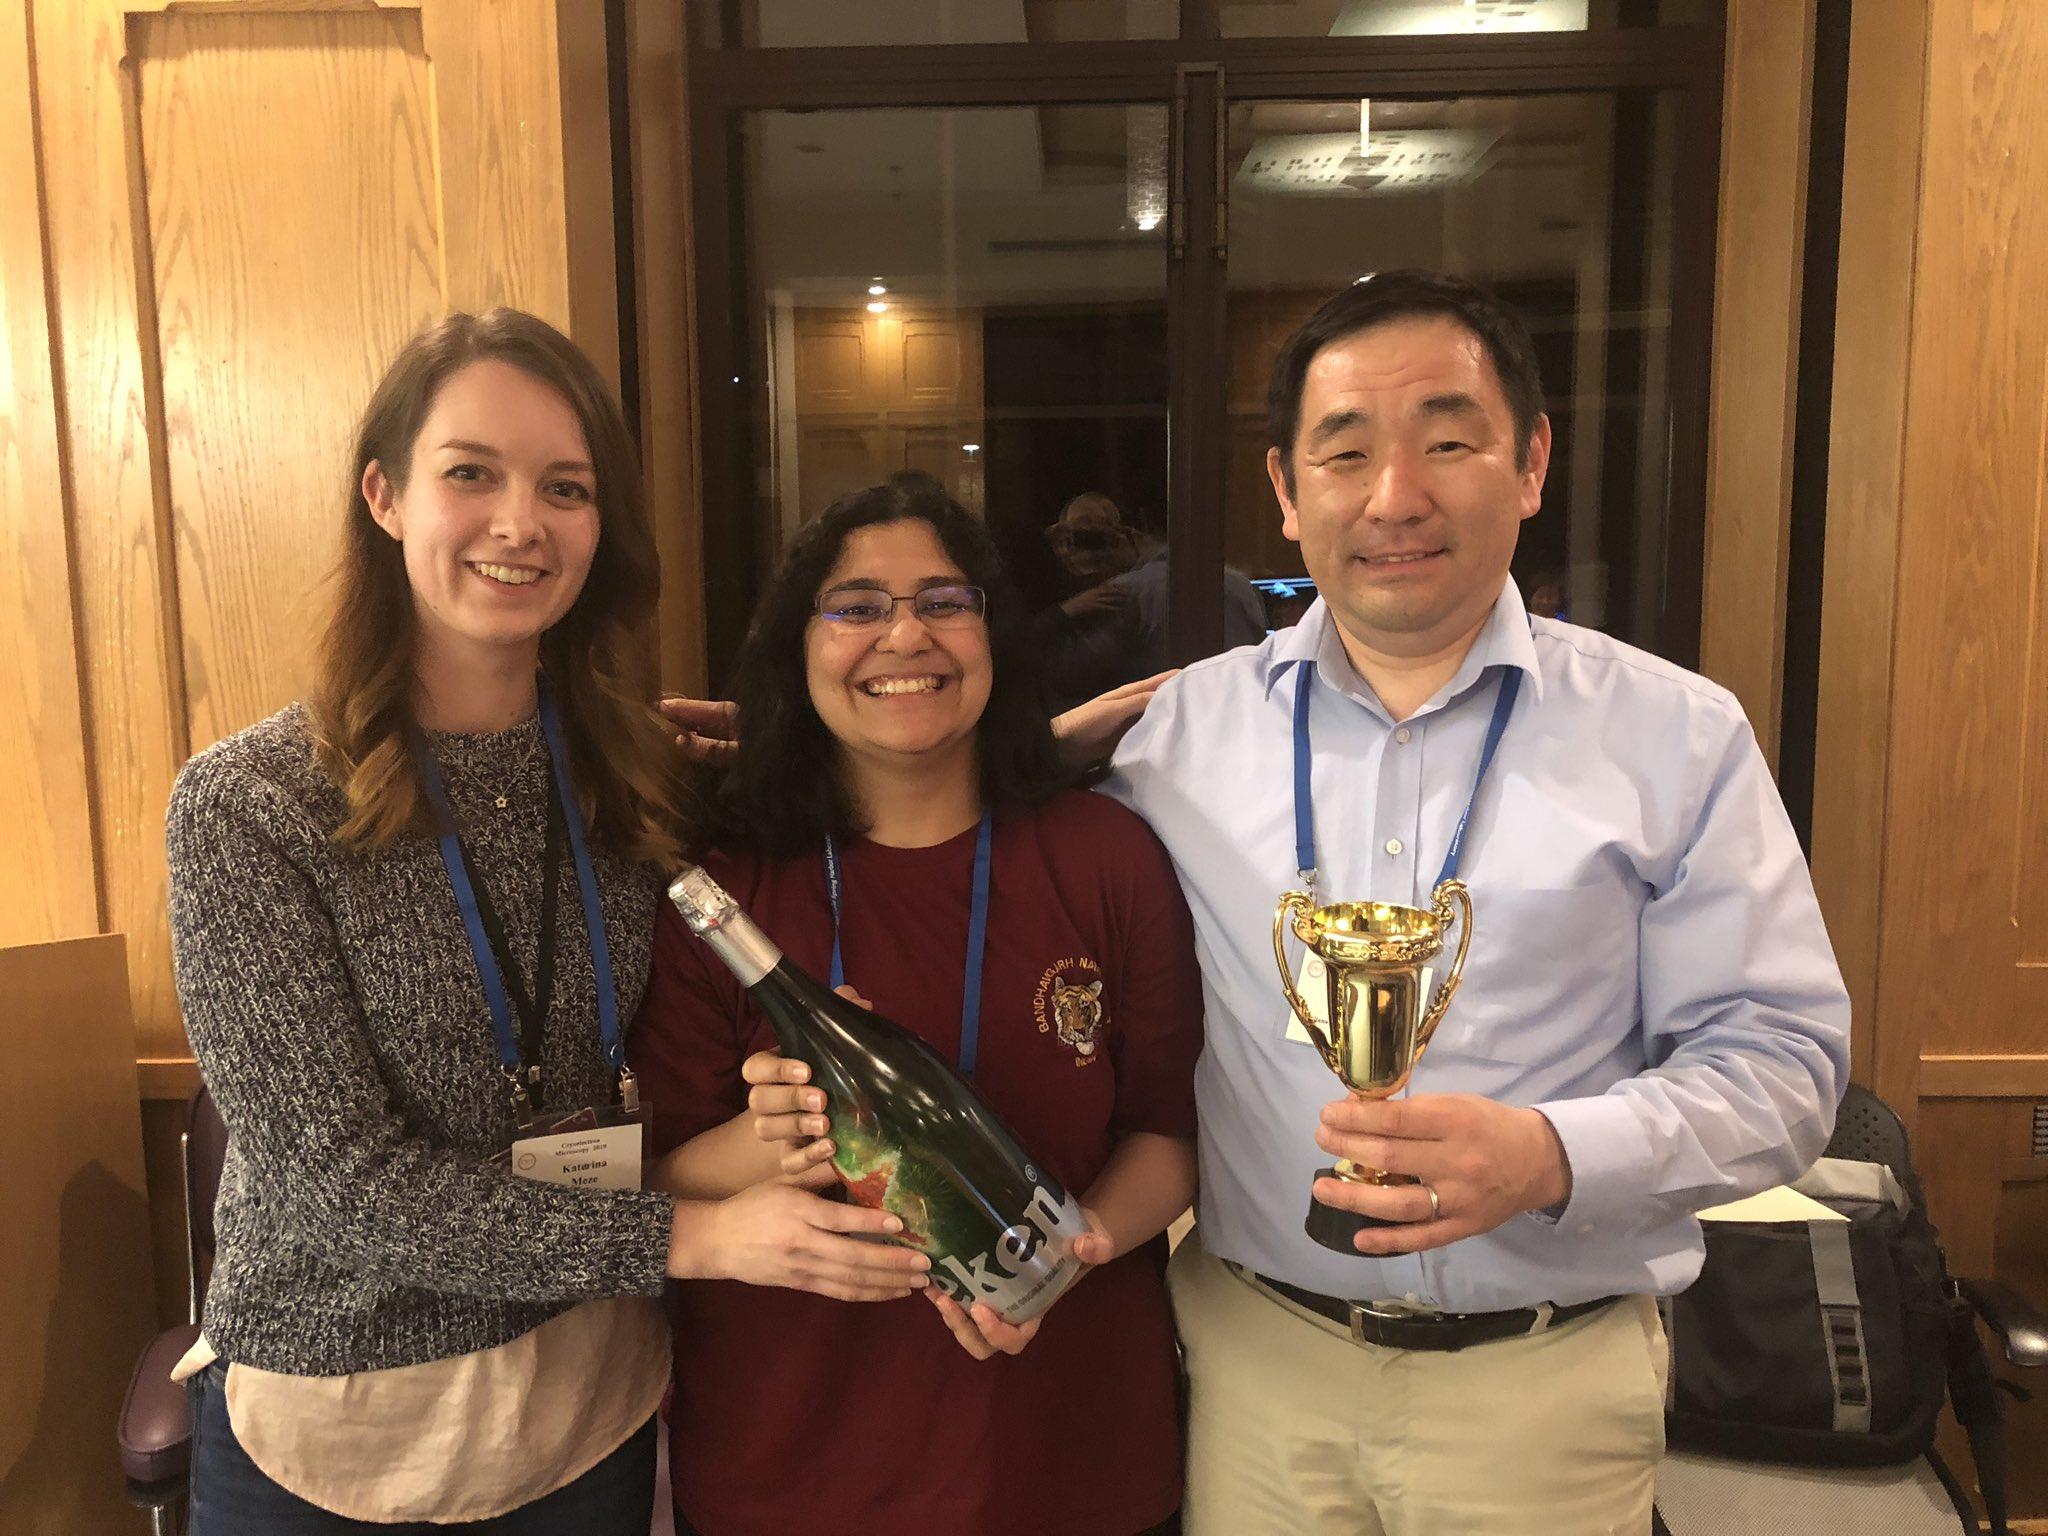 Winning team members of the Cryoelectron Microscopy course's grid freezing competition. L to R: Katerina Meze of CSHL, Kaavya Krishna Kumar, Yuichiro Takagi of Indiana University School of Medicine Image: Yuichiro Takagi